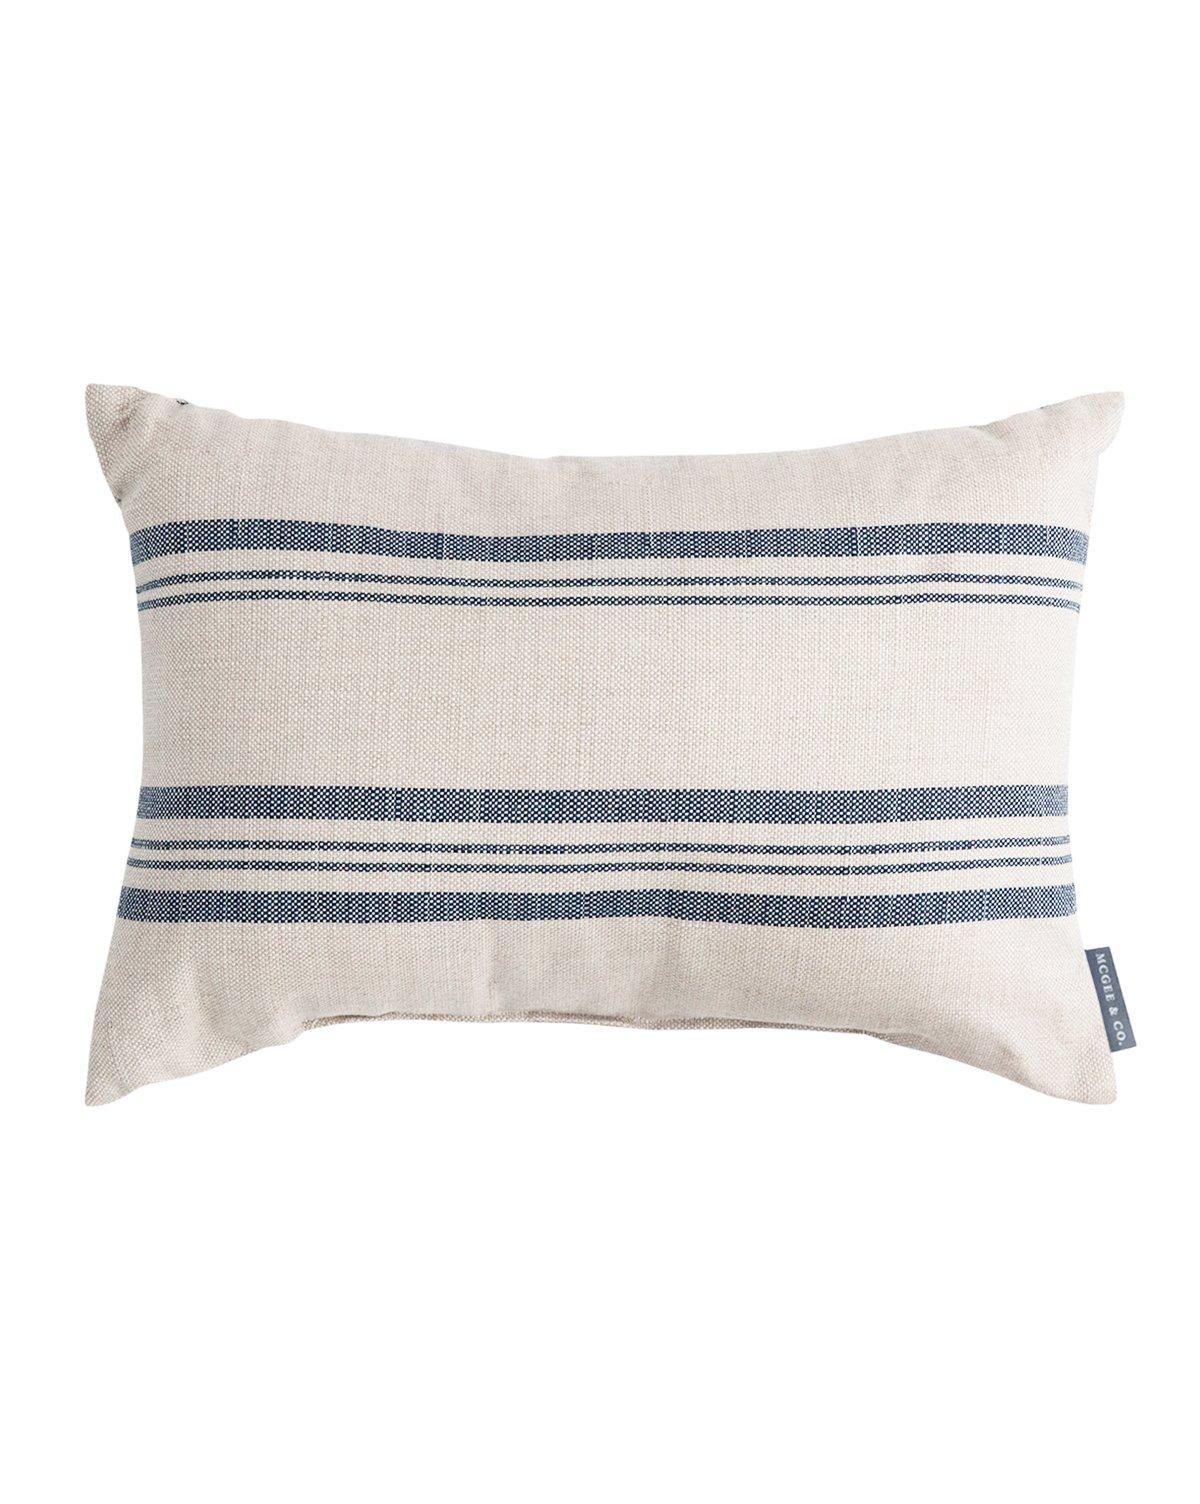 outdoor_pillow_b1060038-96f2-4441-9c45-bc98ed3bba12.jpg